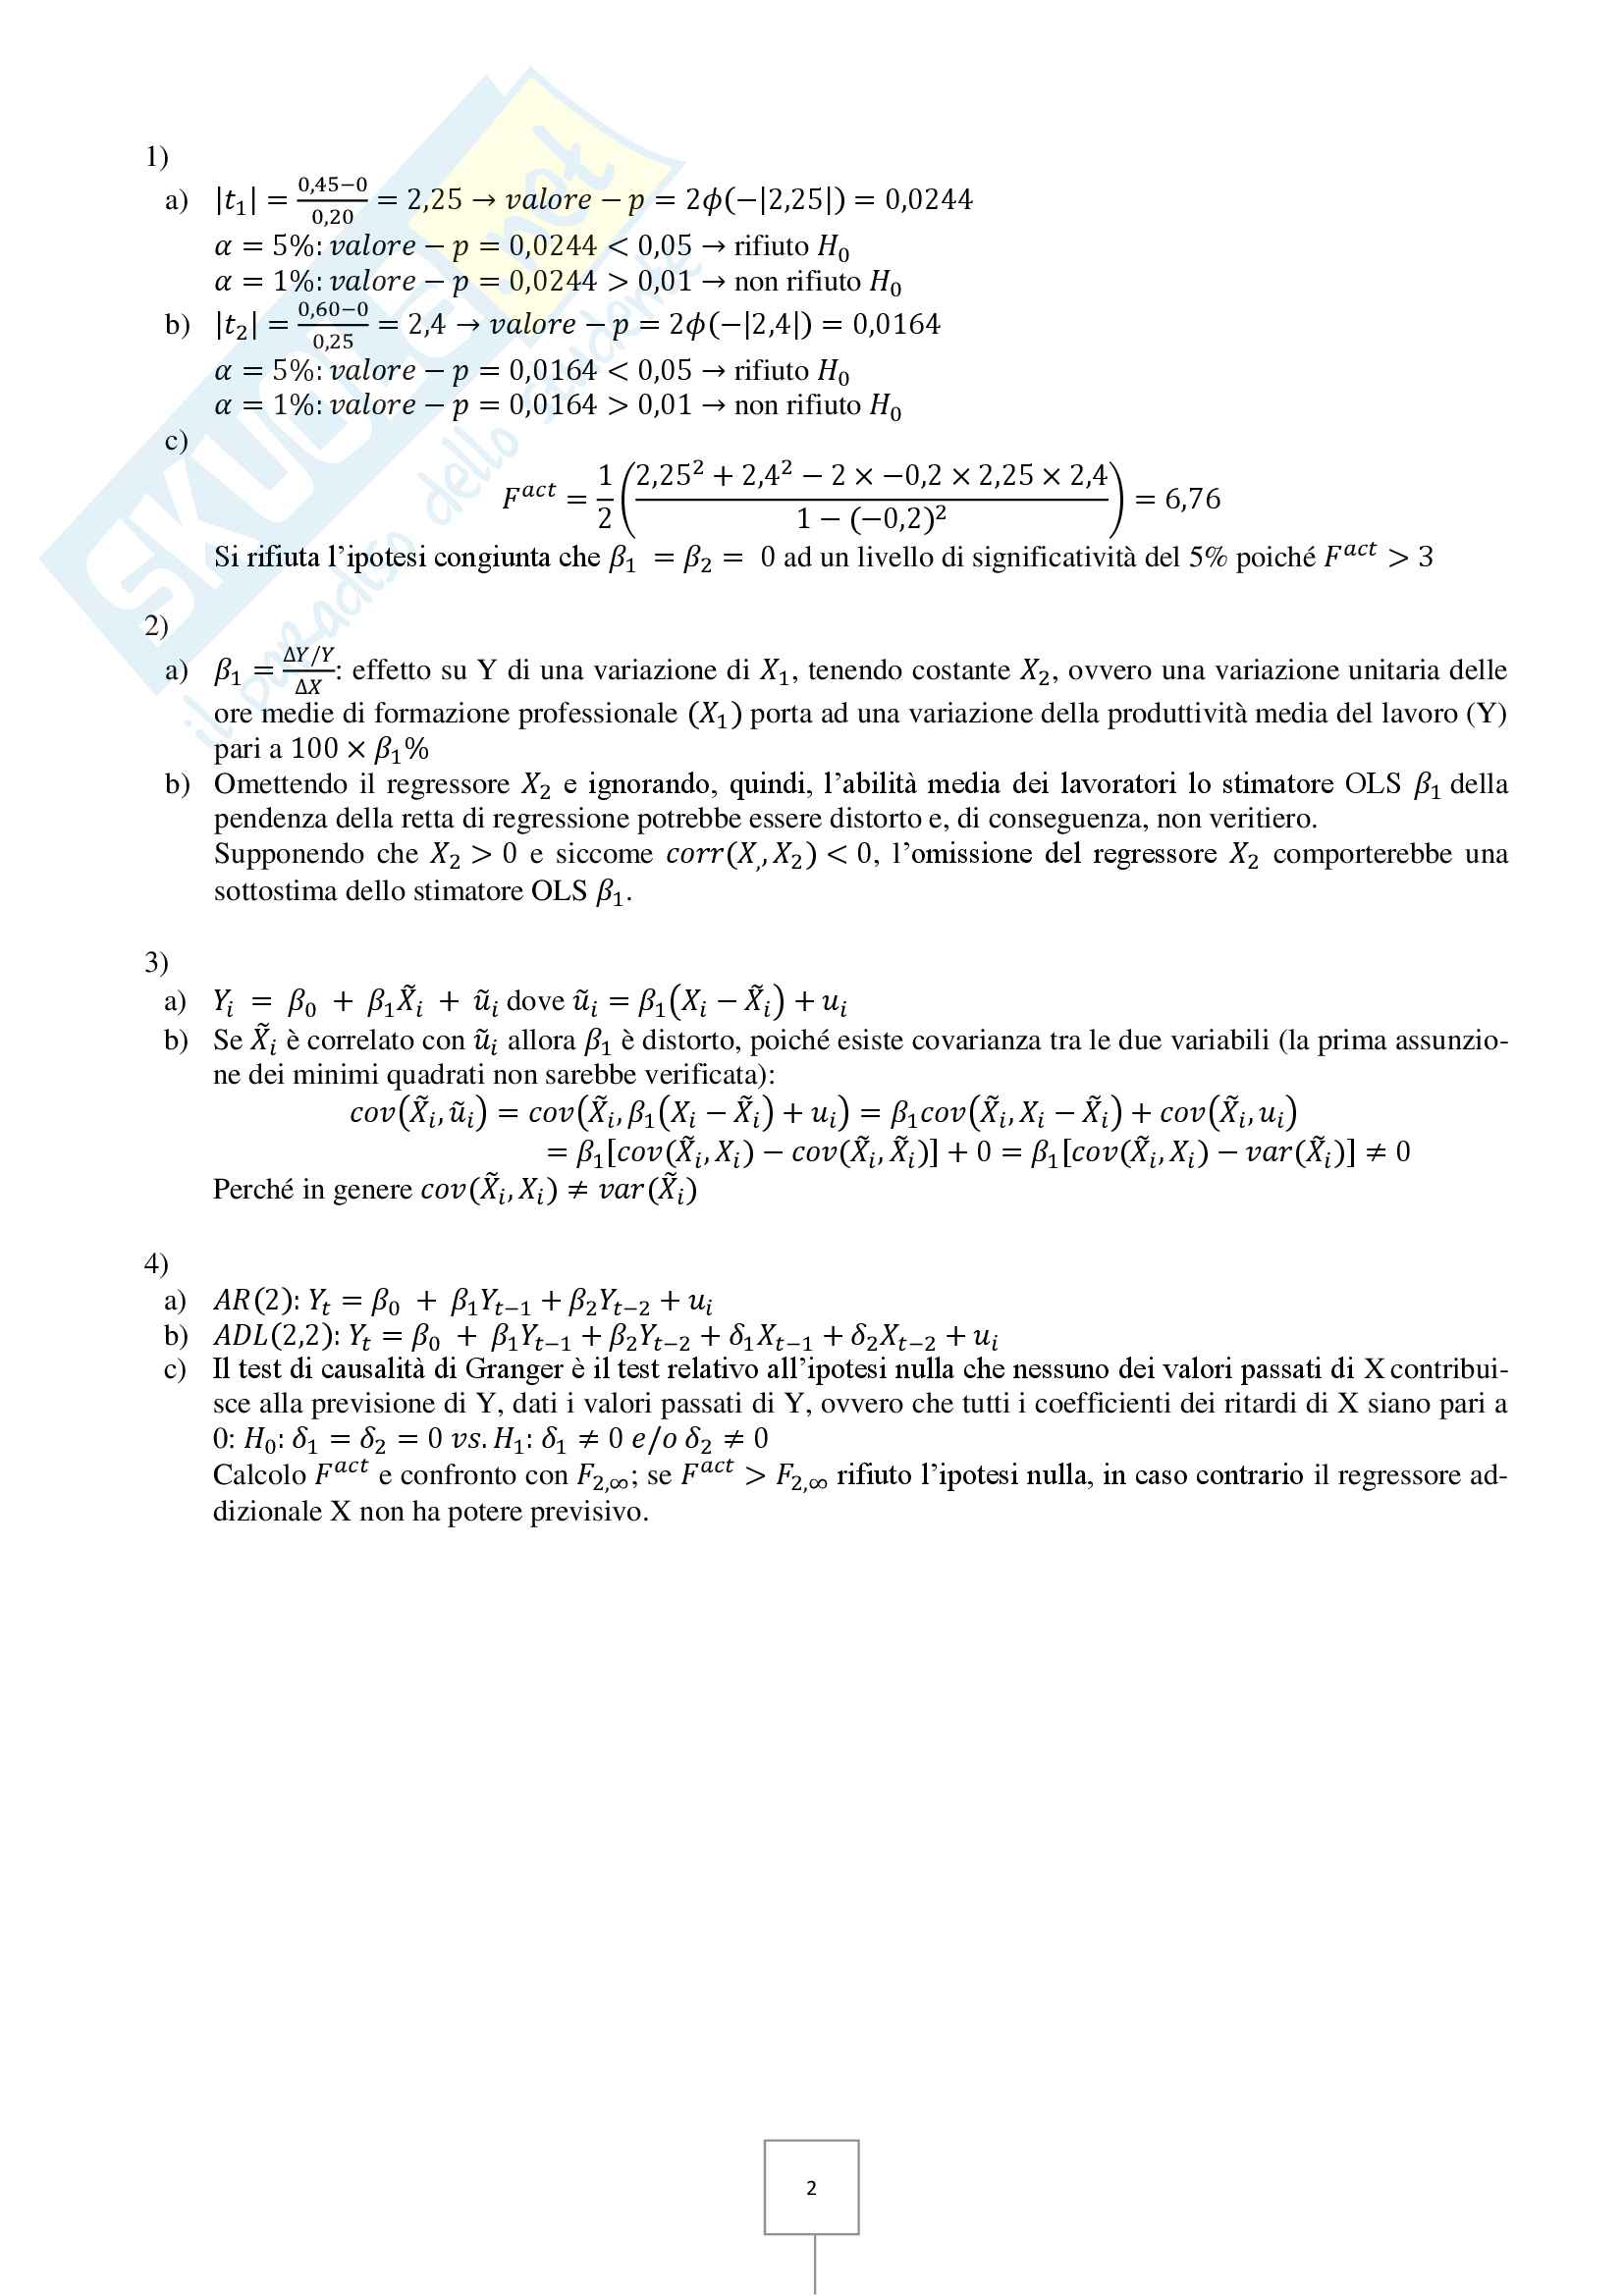 Econometria - Prove d'esame risolte Pag. 2